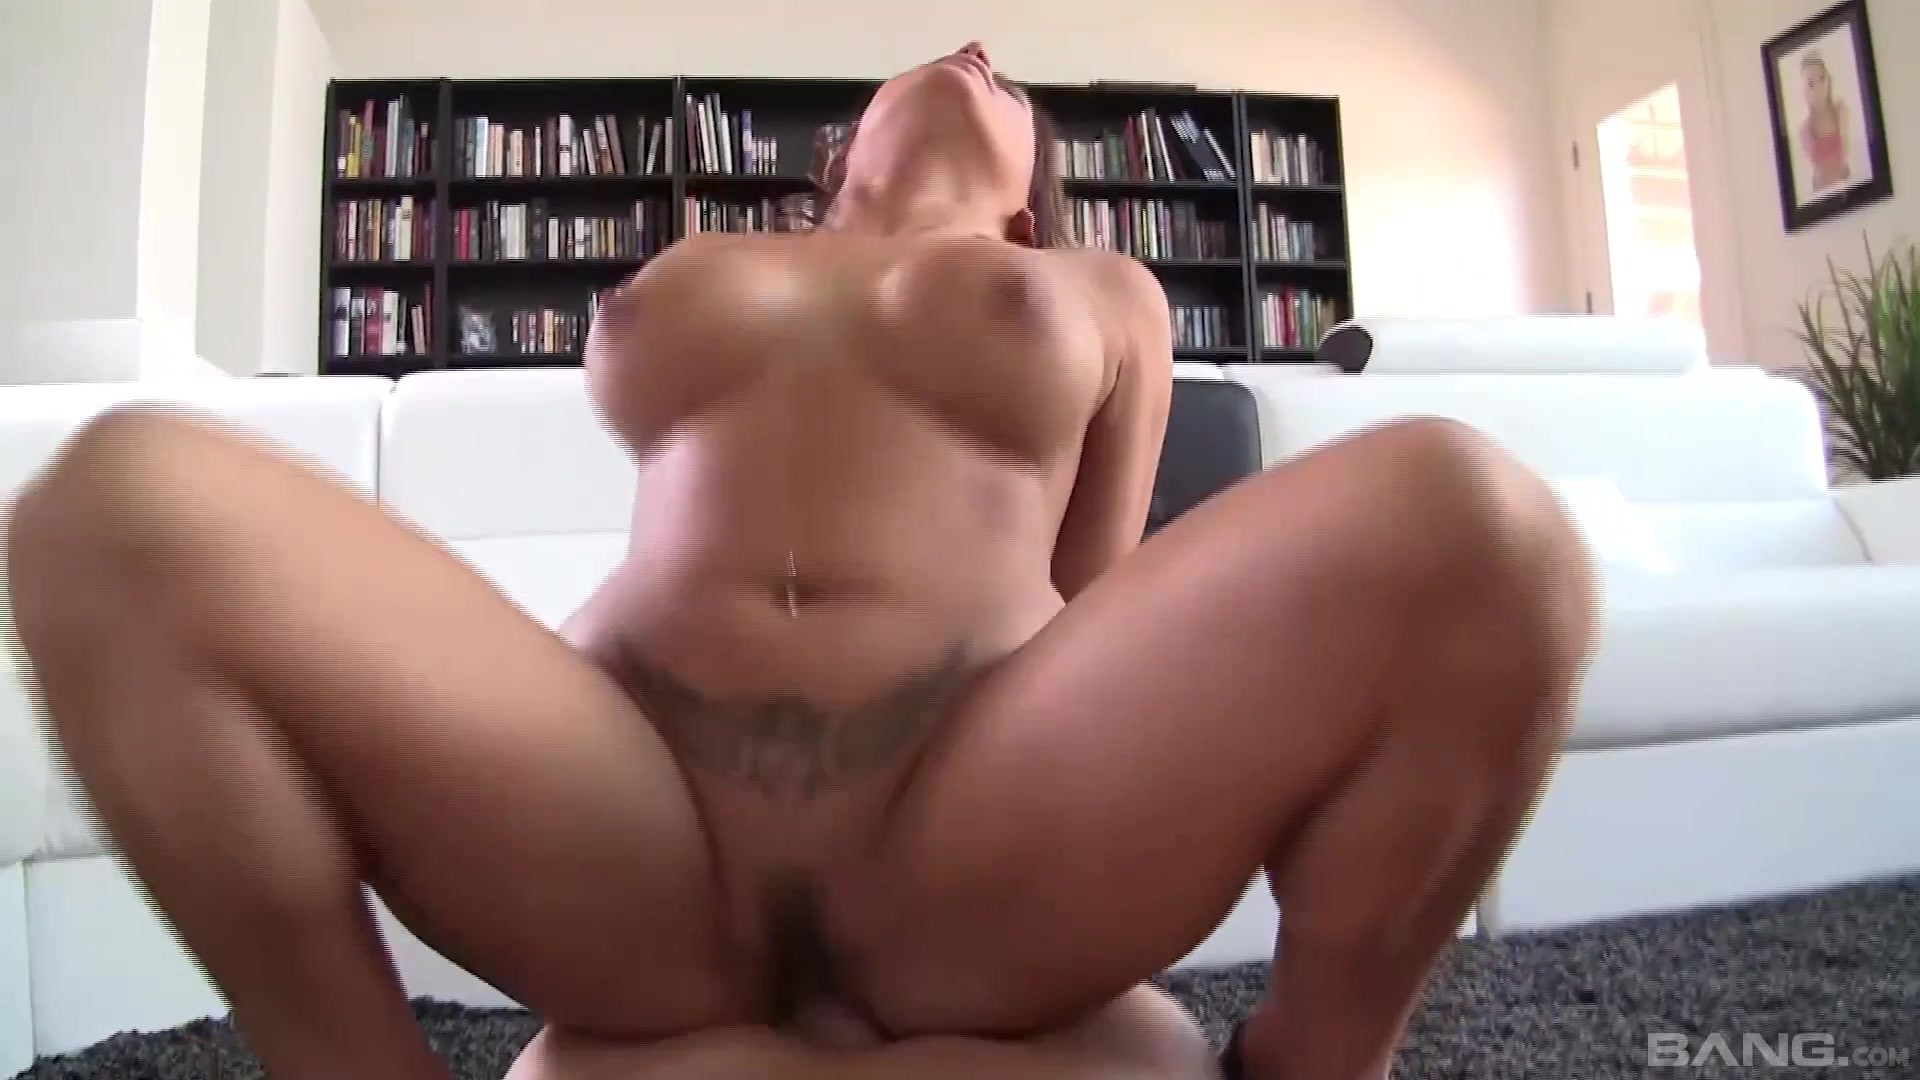 Big Tit POV Banging XXX 1080p WEBRip MP4-VSEX